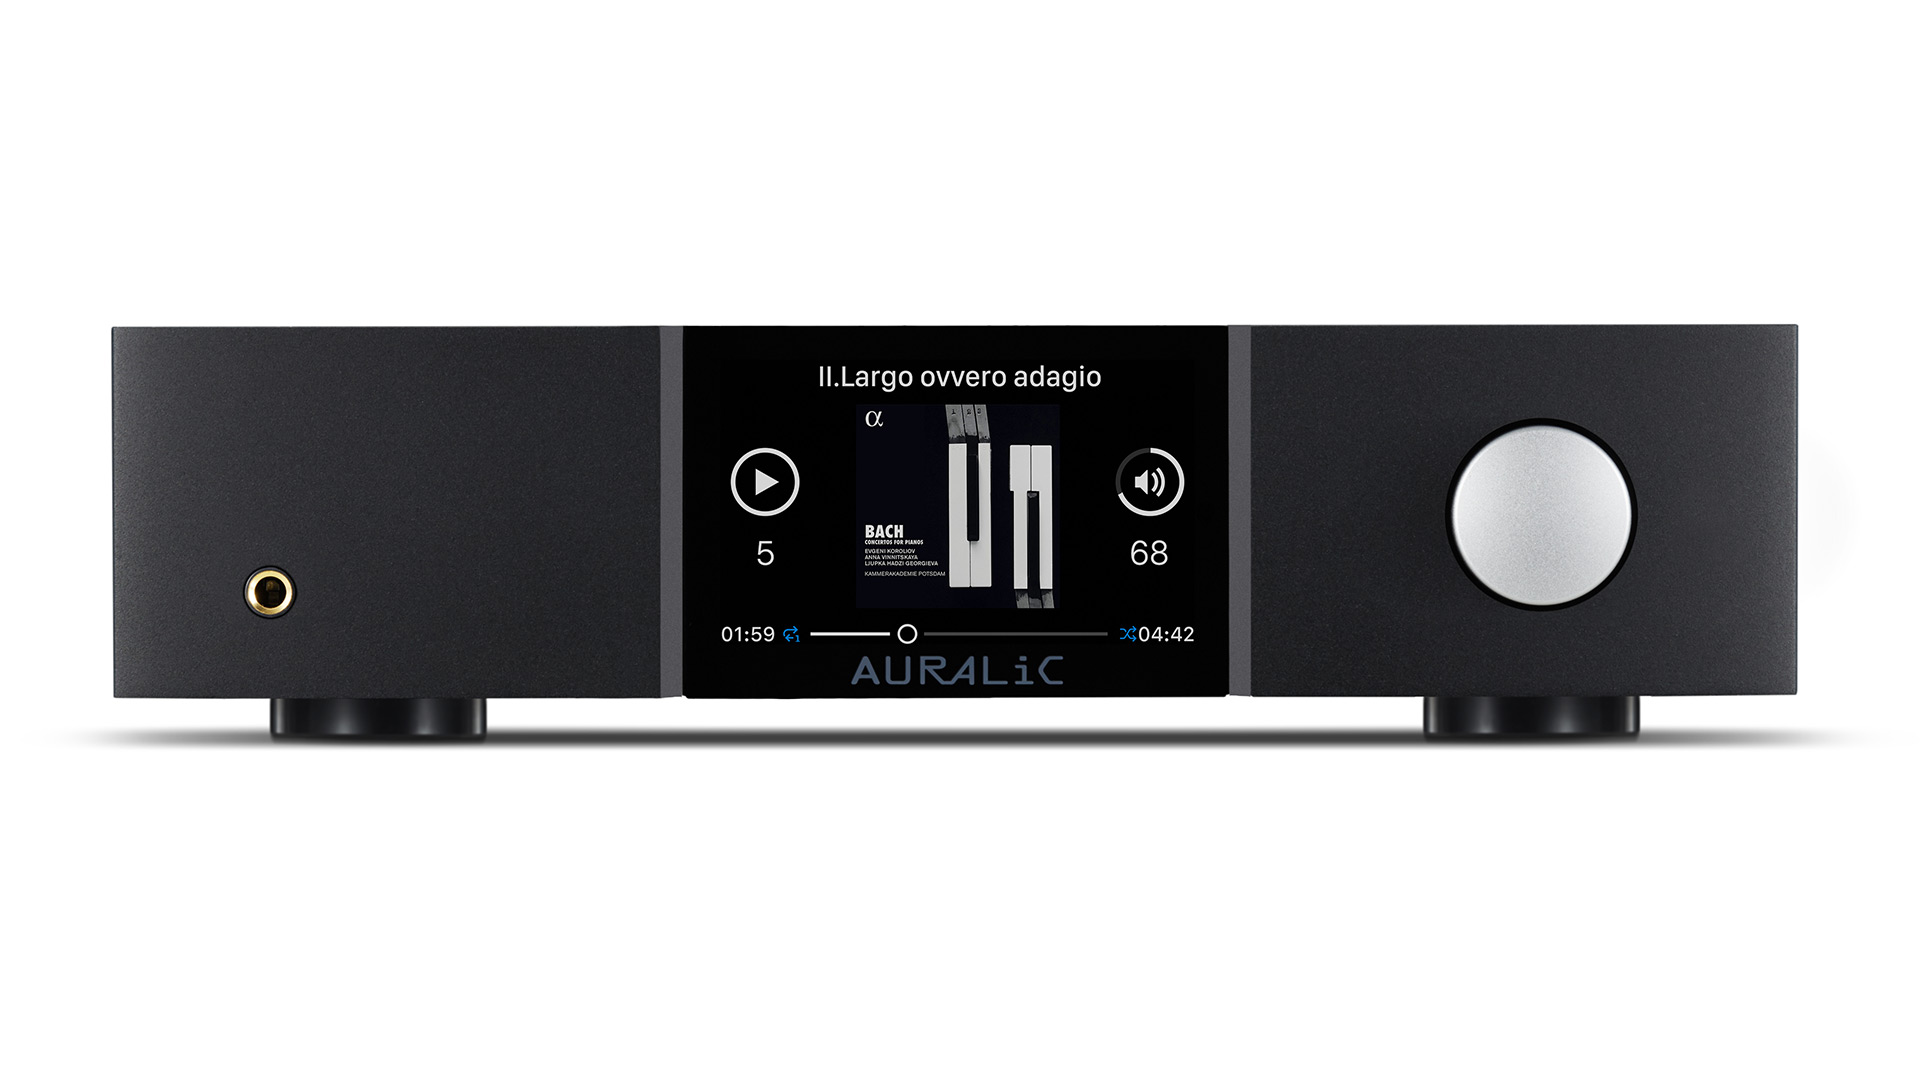 AURALiC Altair G1 | Unilet Sound & Vision